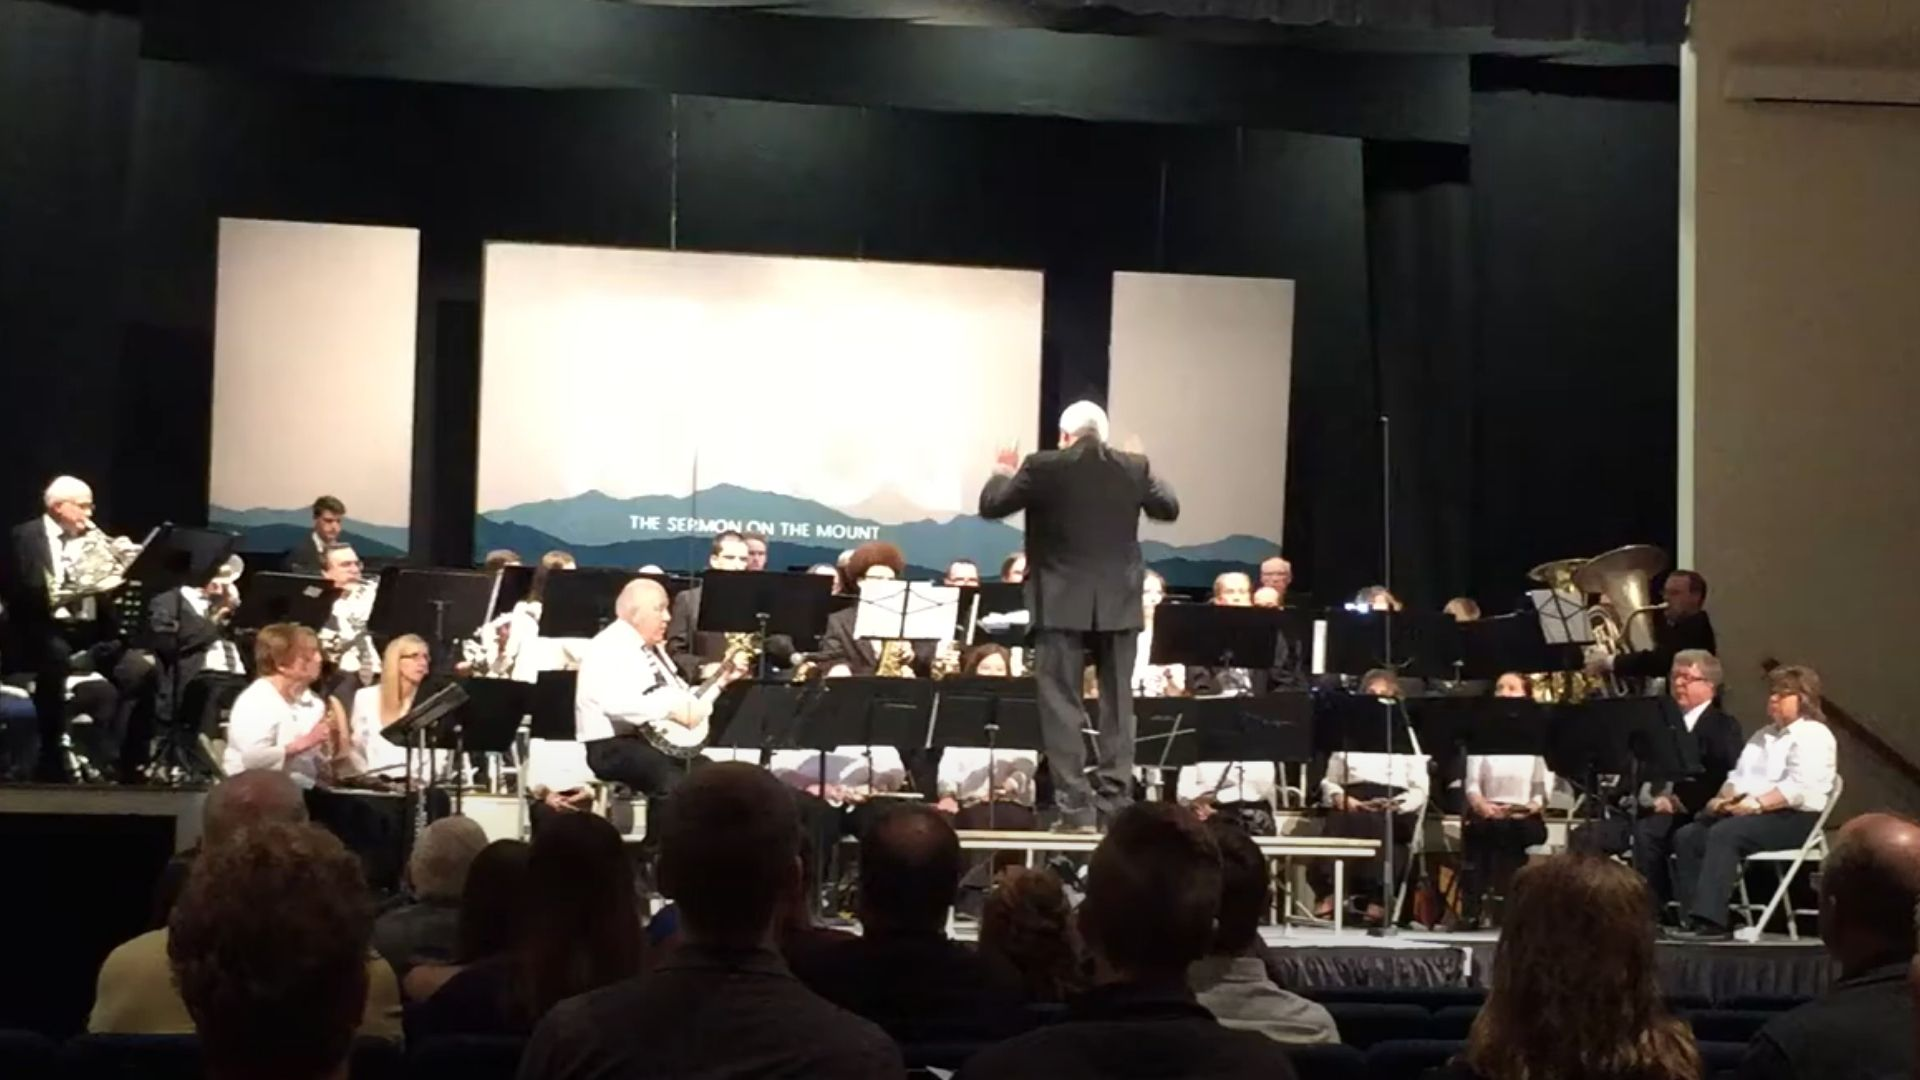 FSSB performing Retaliation by Joe Eigenbrot